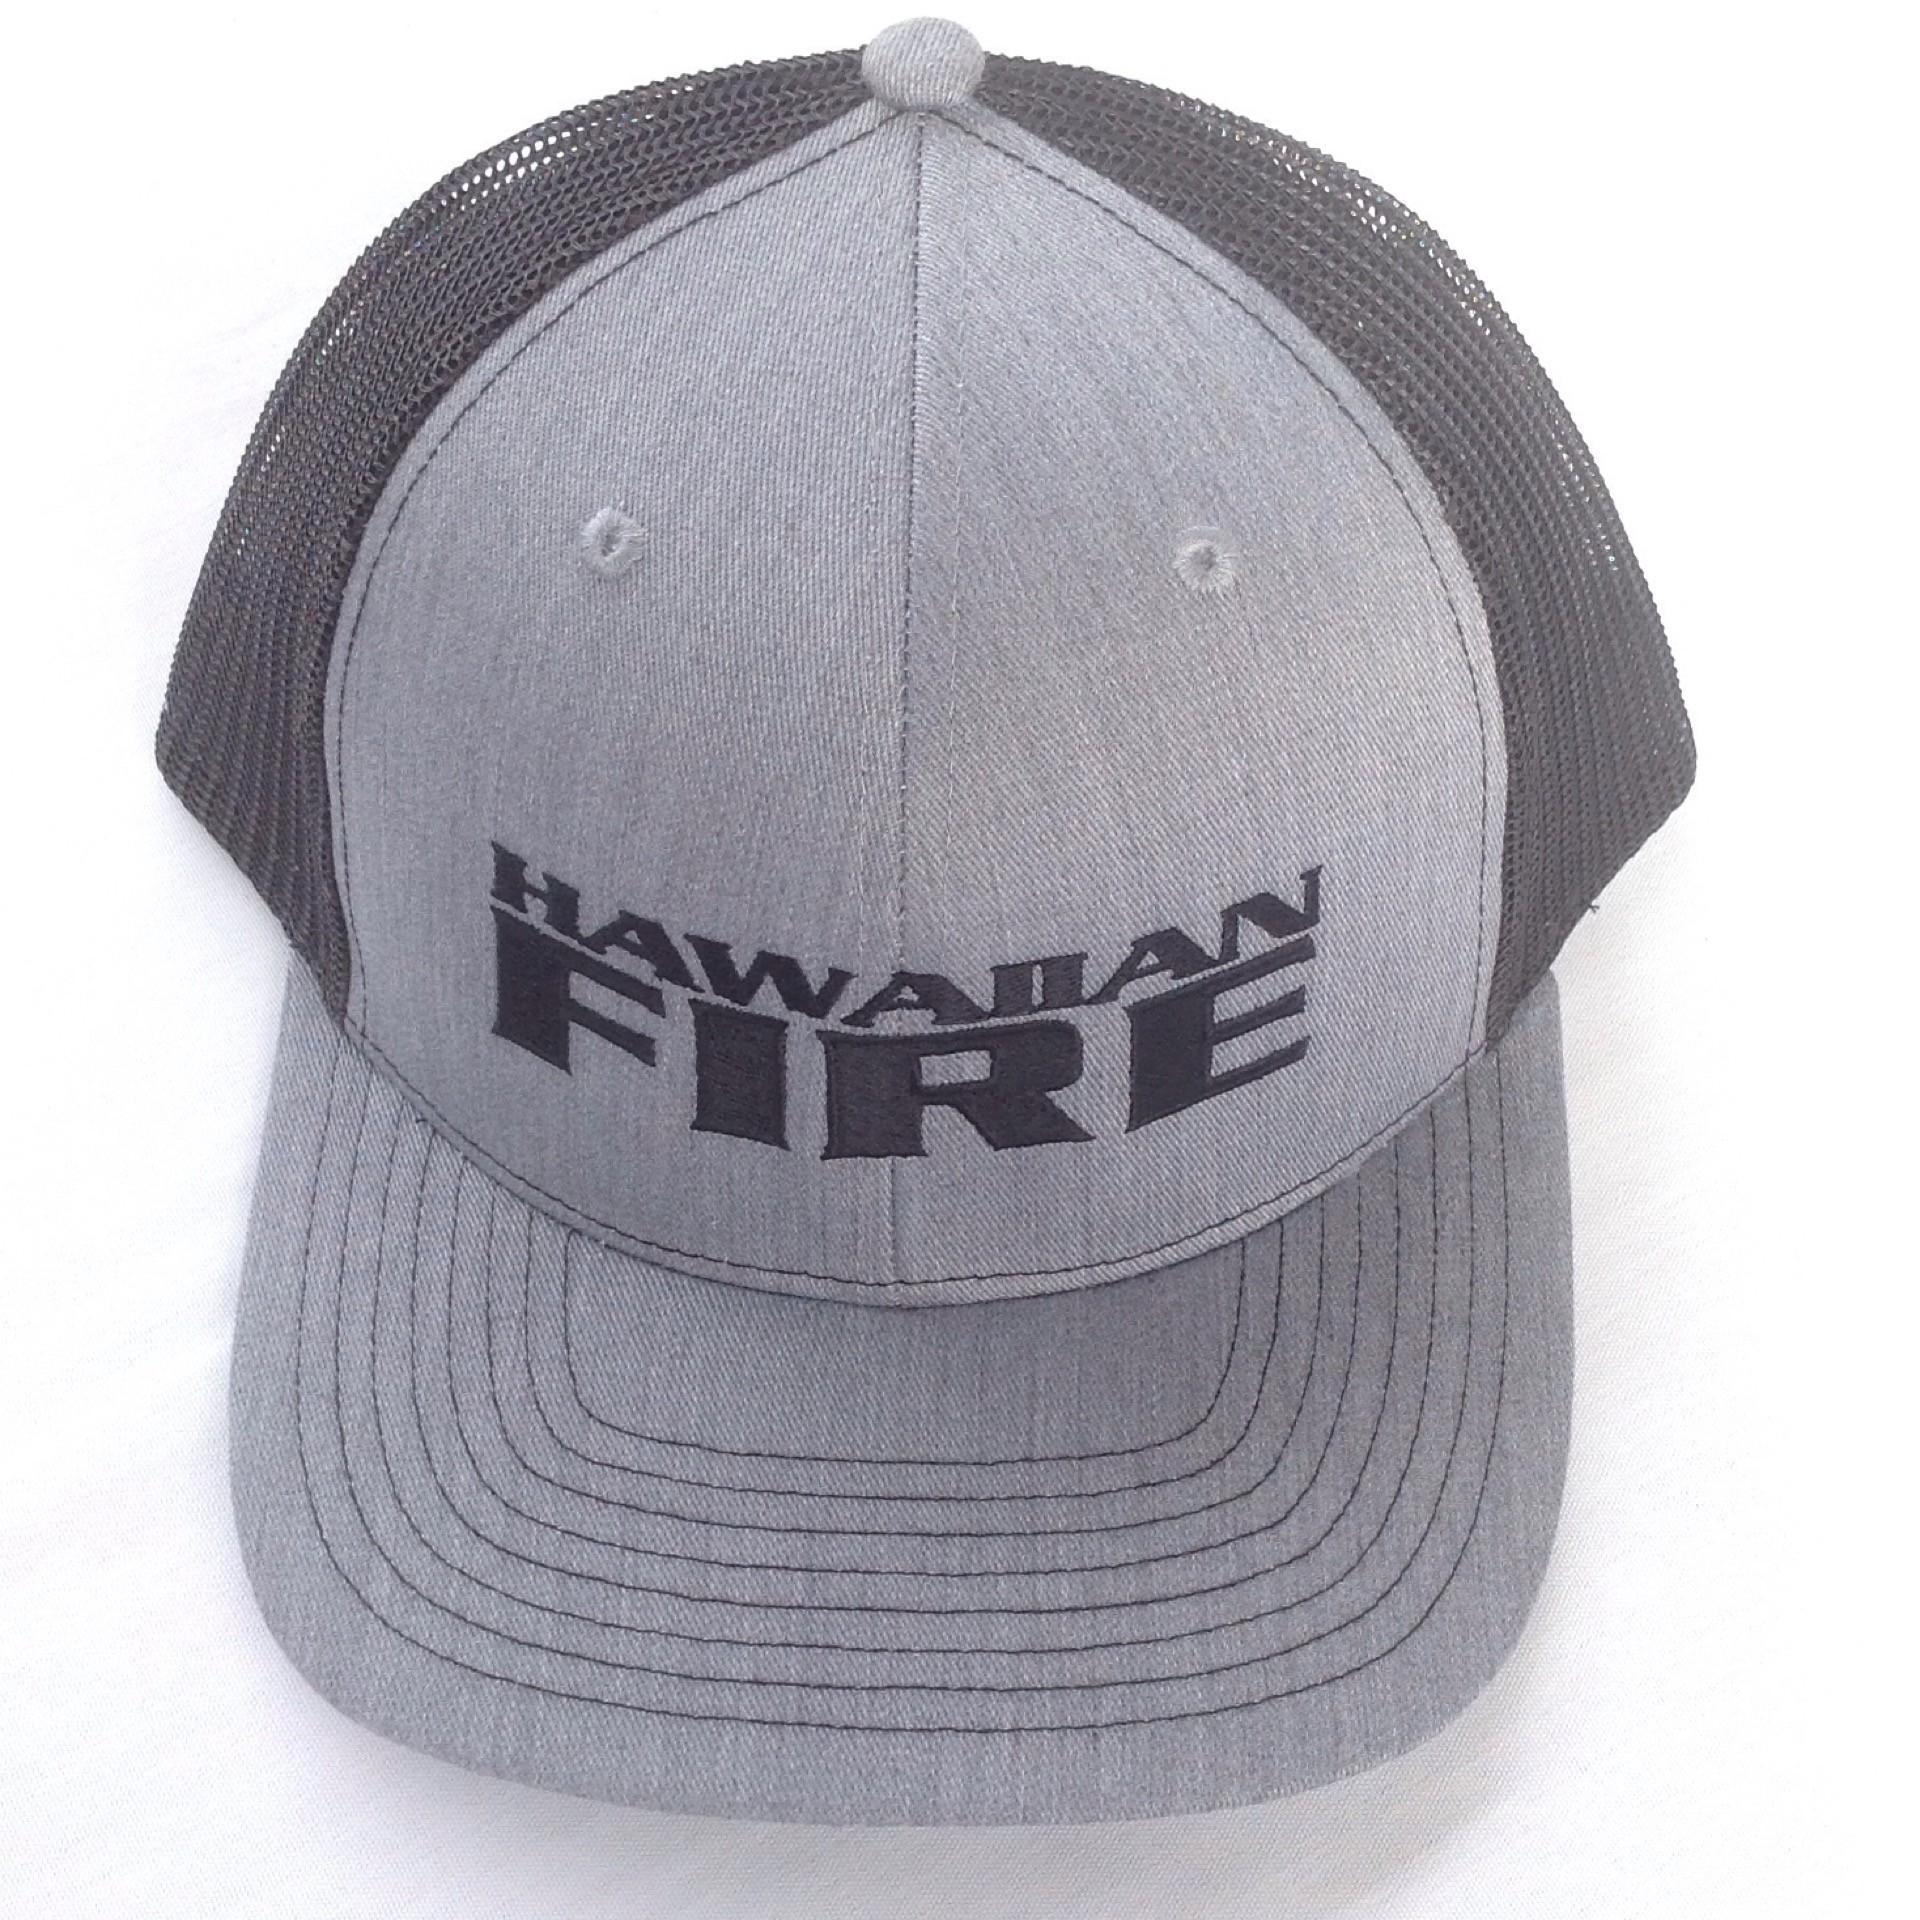 HFD Hat B6M7ZJPOPGGK5T6IT6VY36XL